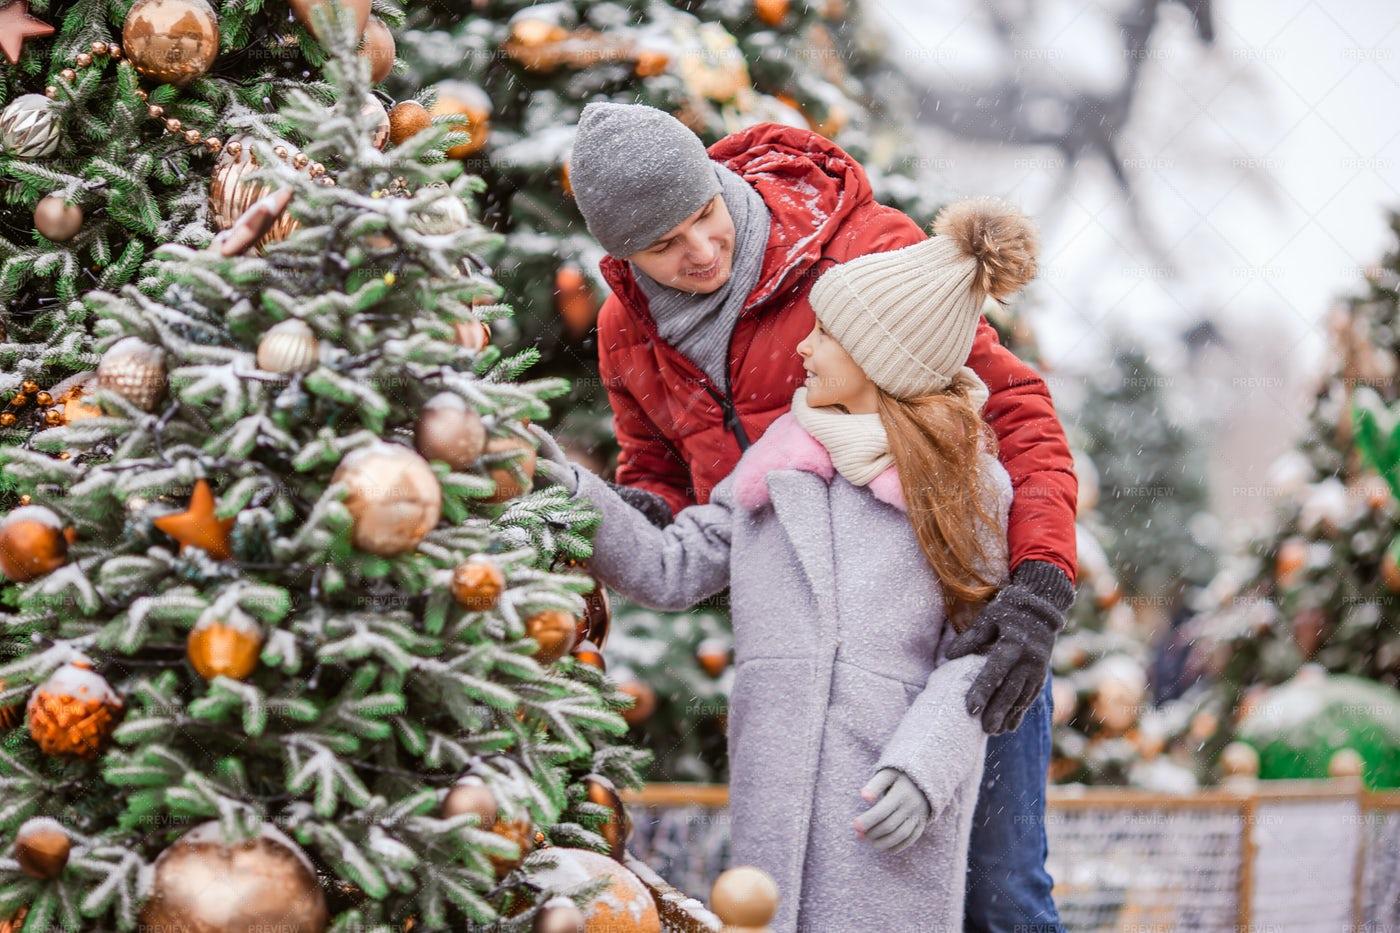 Family Admiring Christmas Trees: Stock Photos